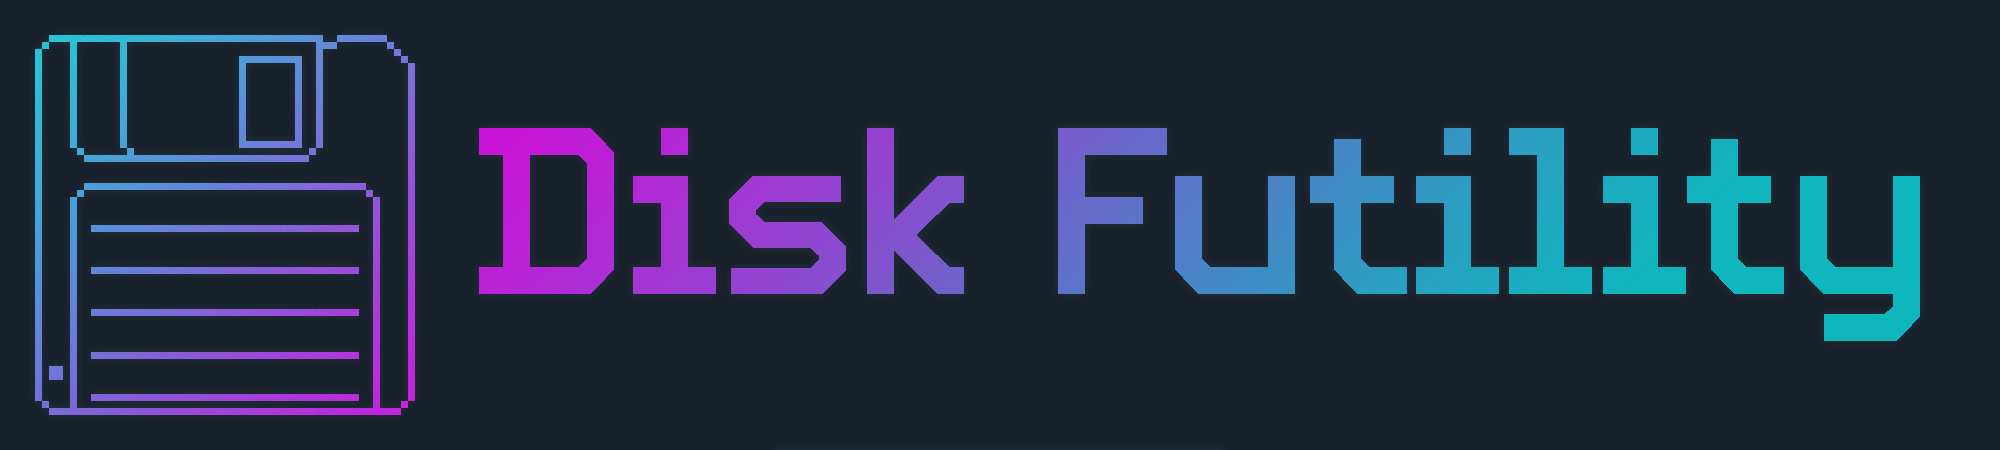 Disk Futility